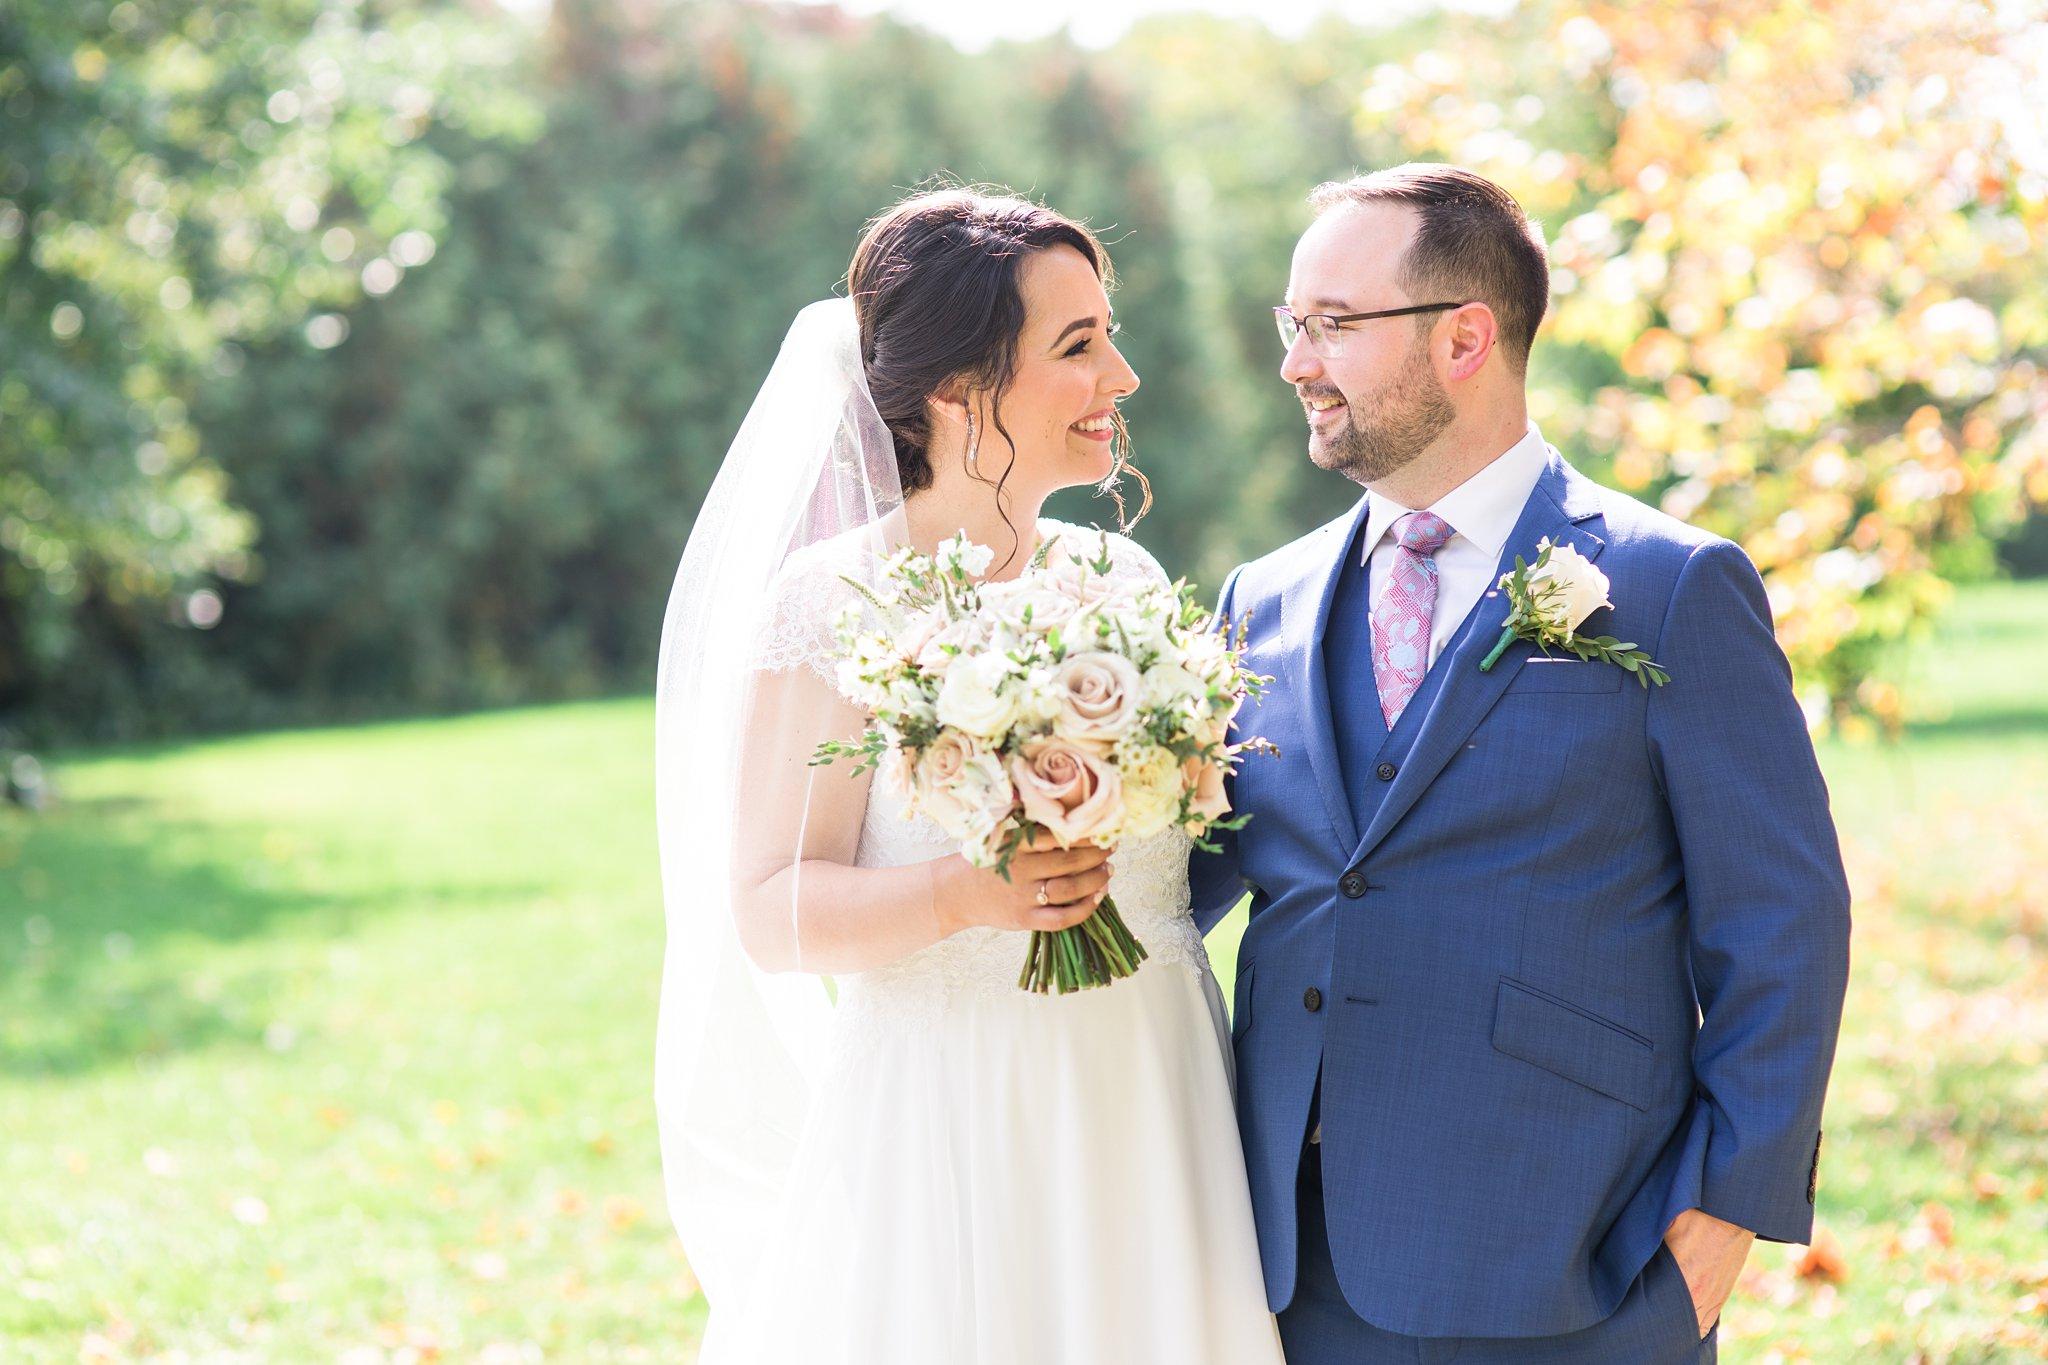 Arboretum fall wedding photos, Britannia Yacht Club Wedding Photos, Amy Pinder Photography